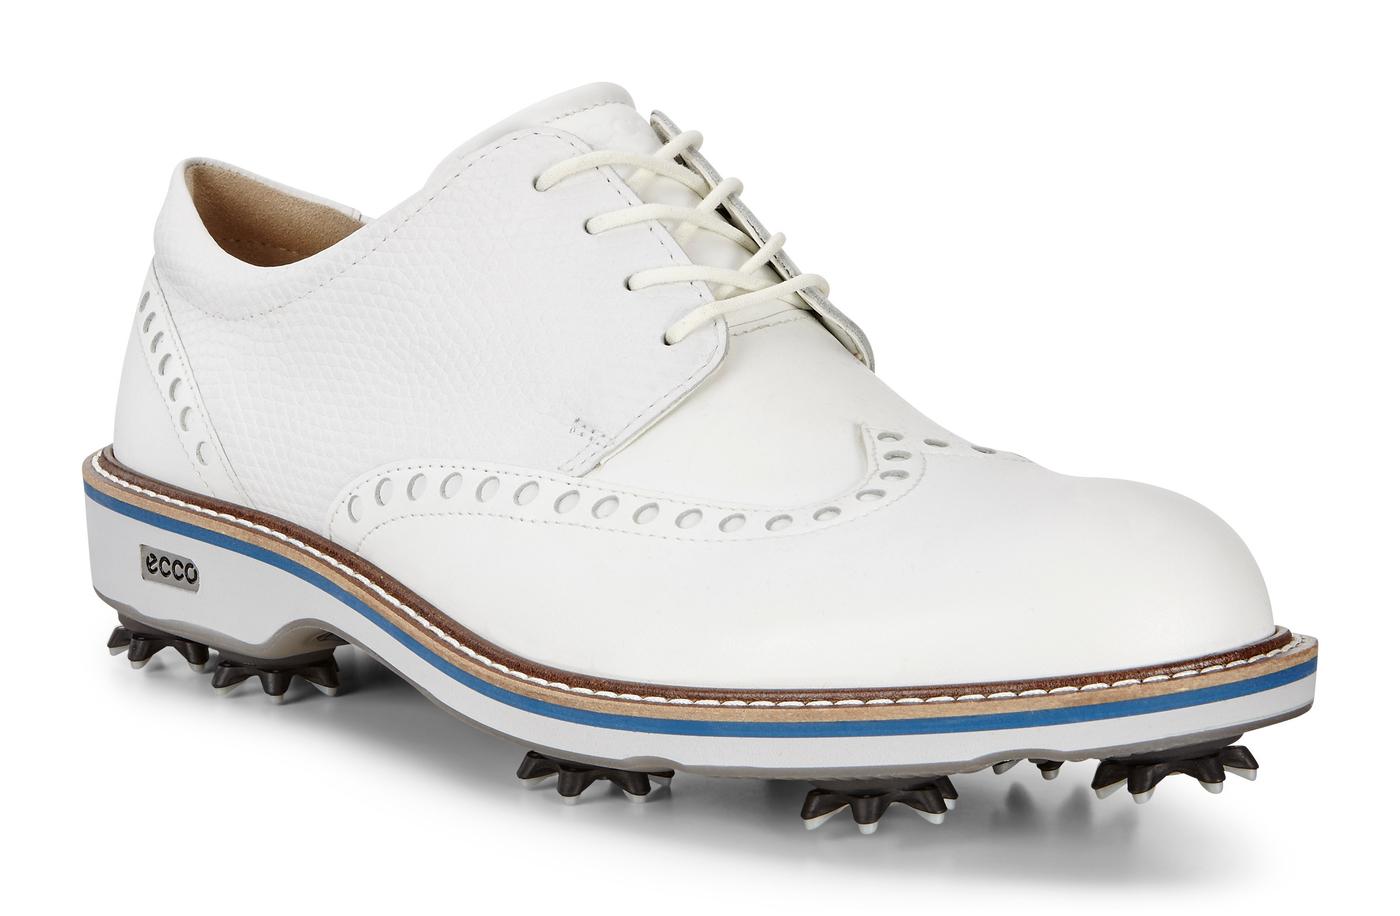 ECCO LUX Mens Golf